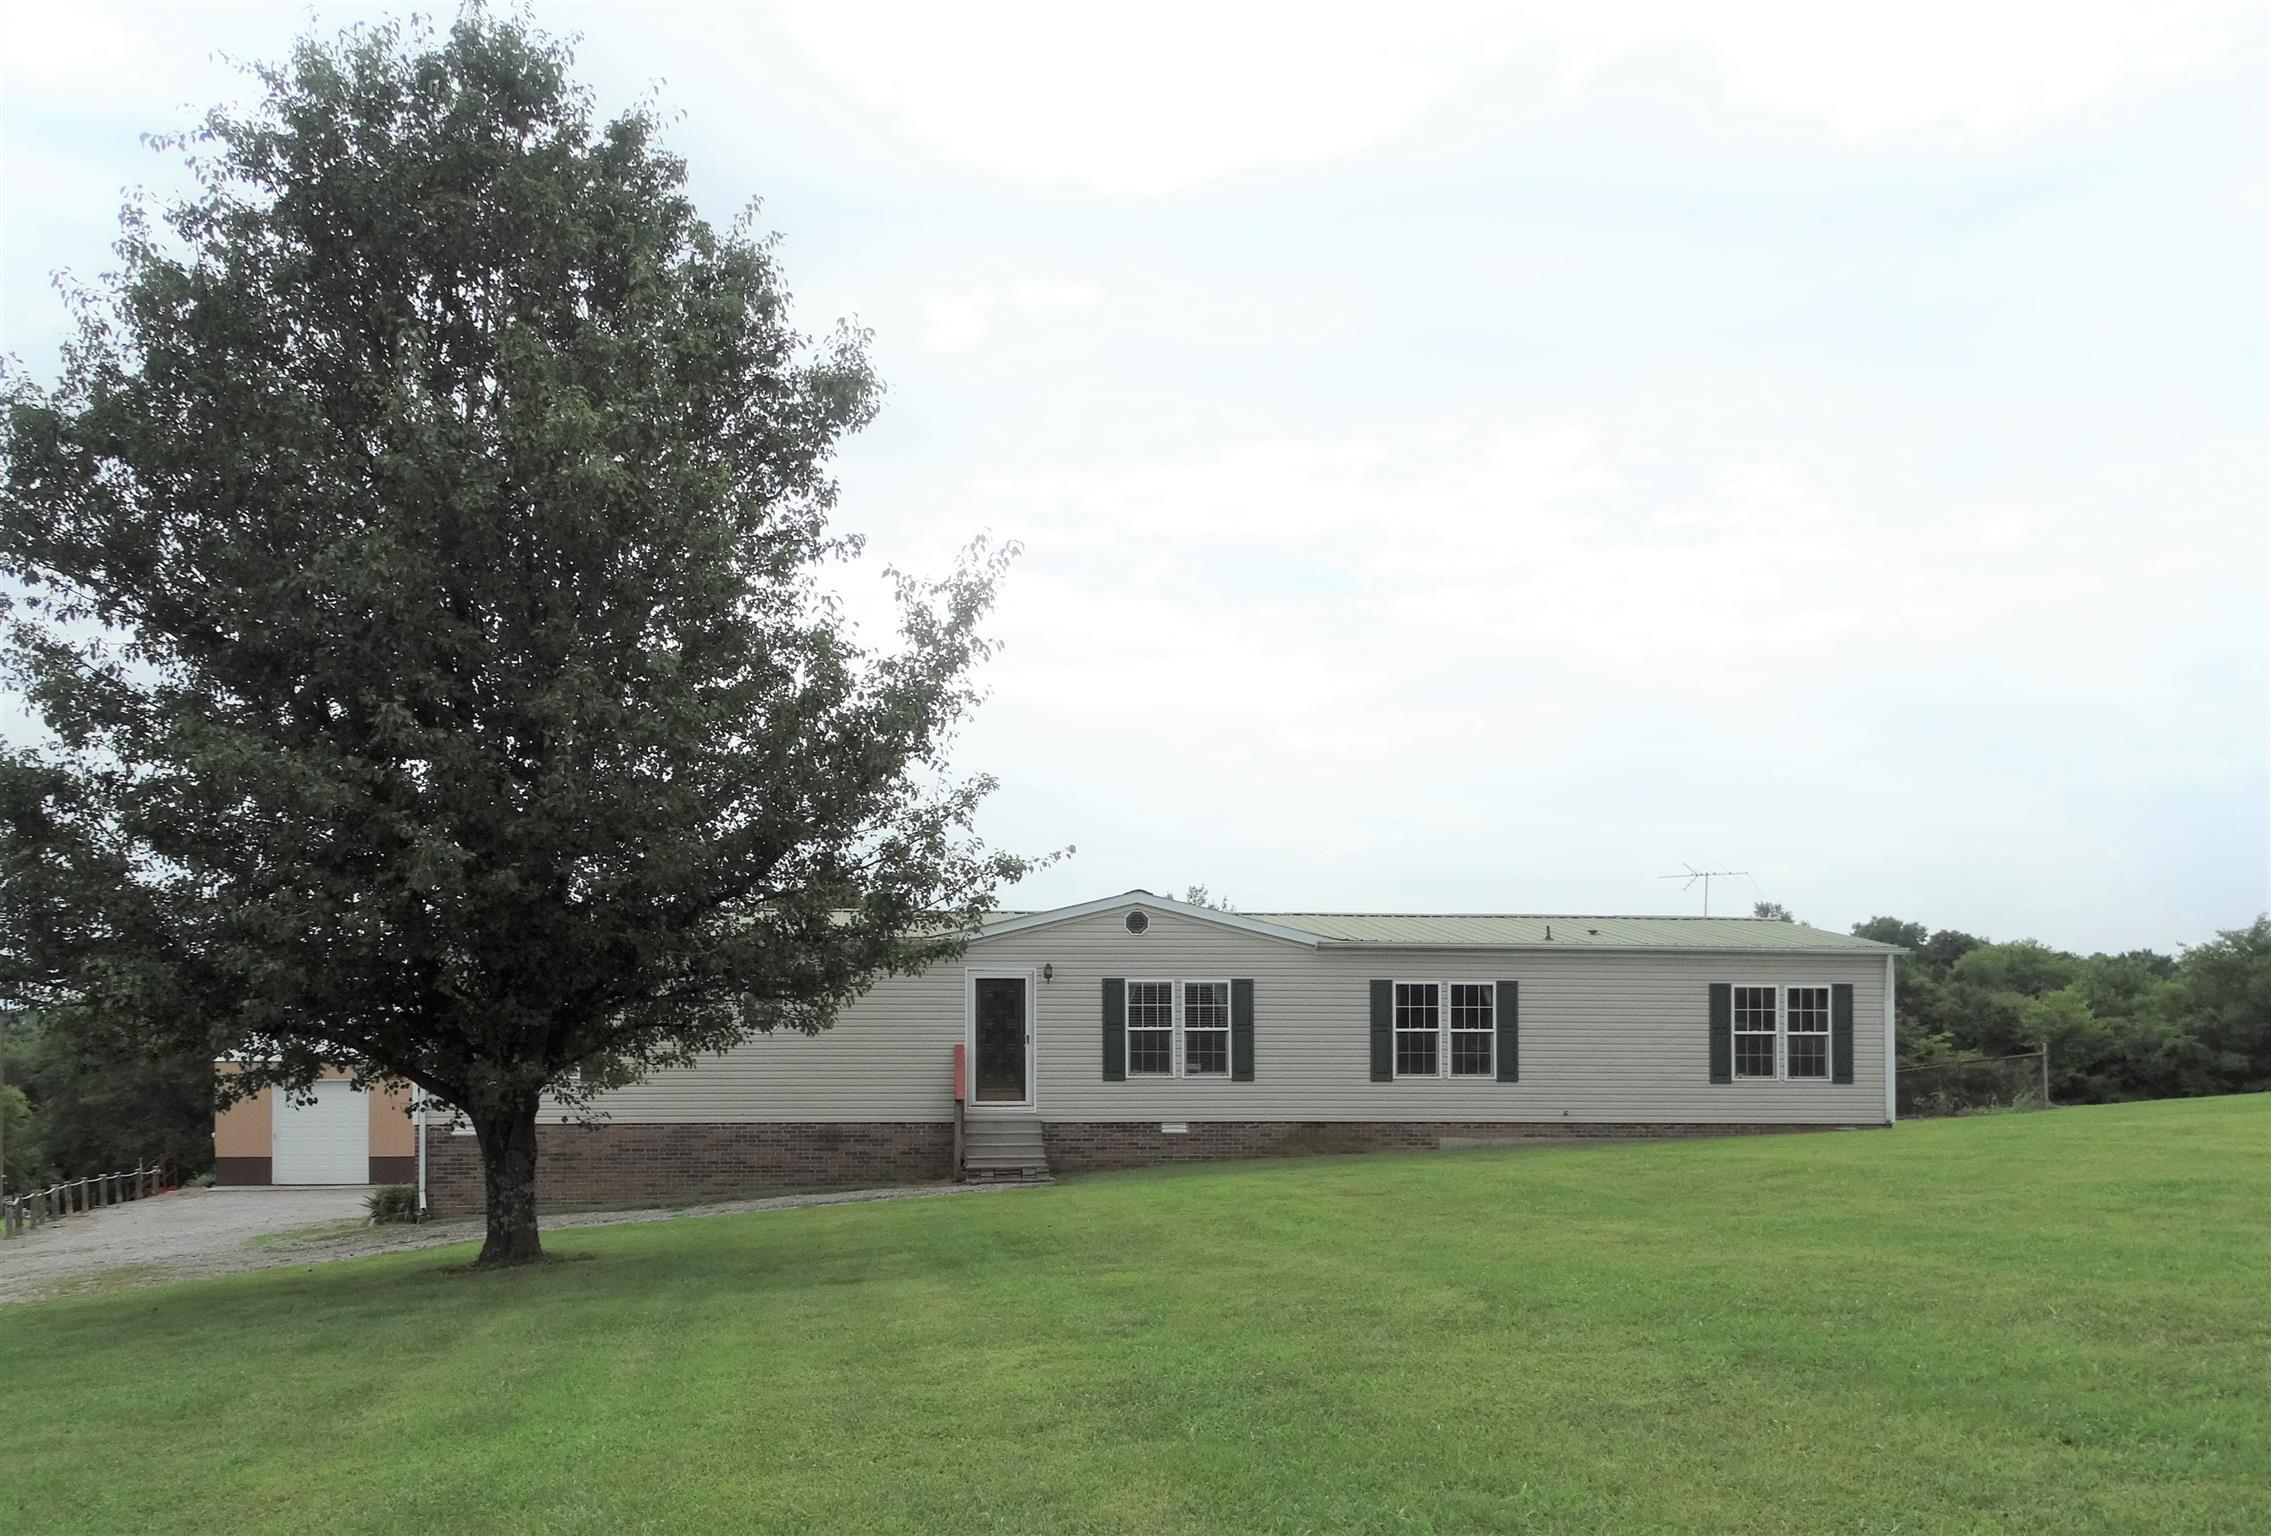 295 Crenshaw Rd, Hartsville, TN 37074 - Hartsville, TN real estate listing